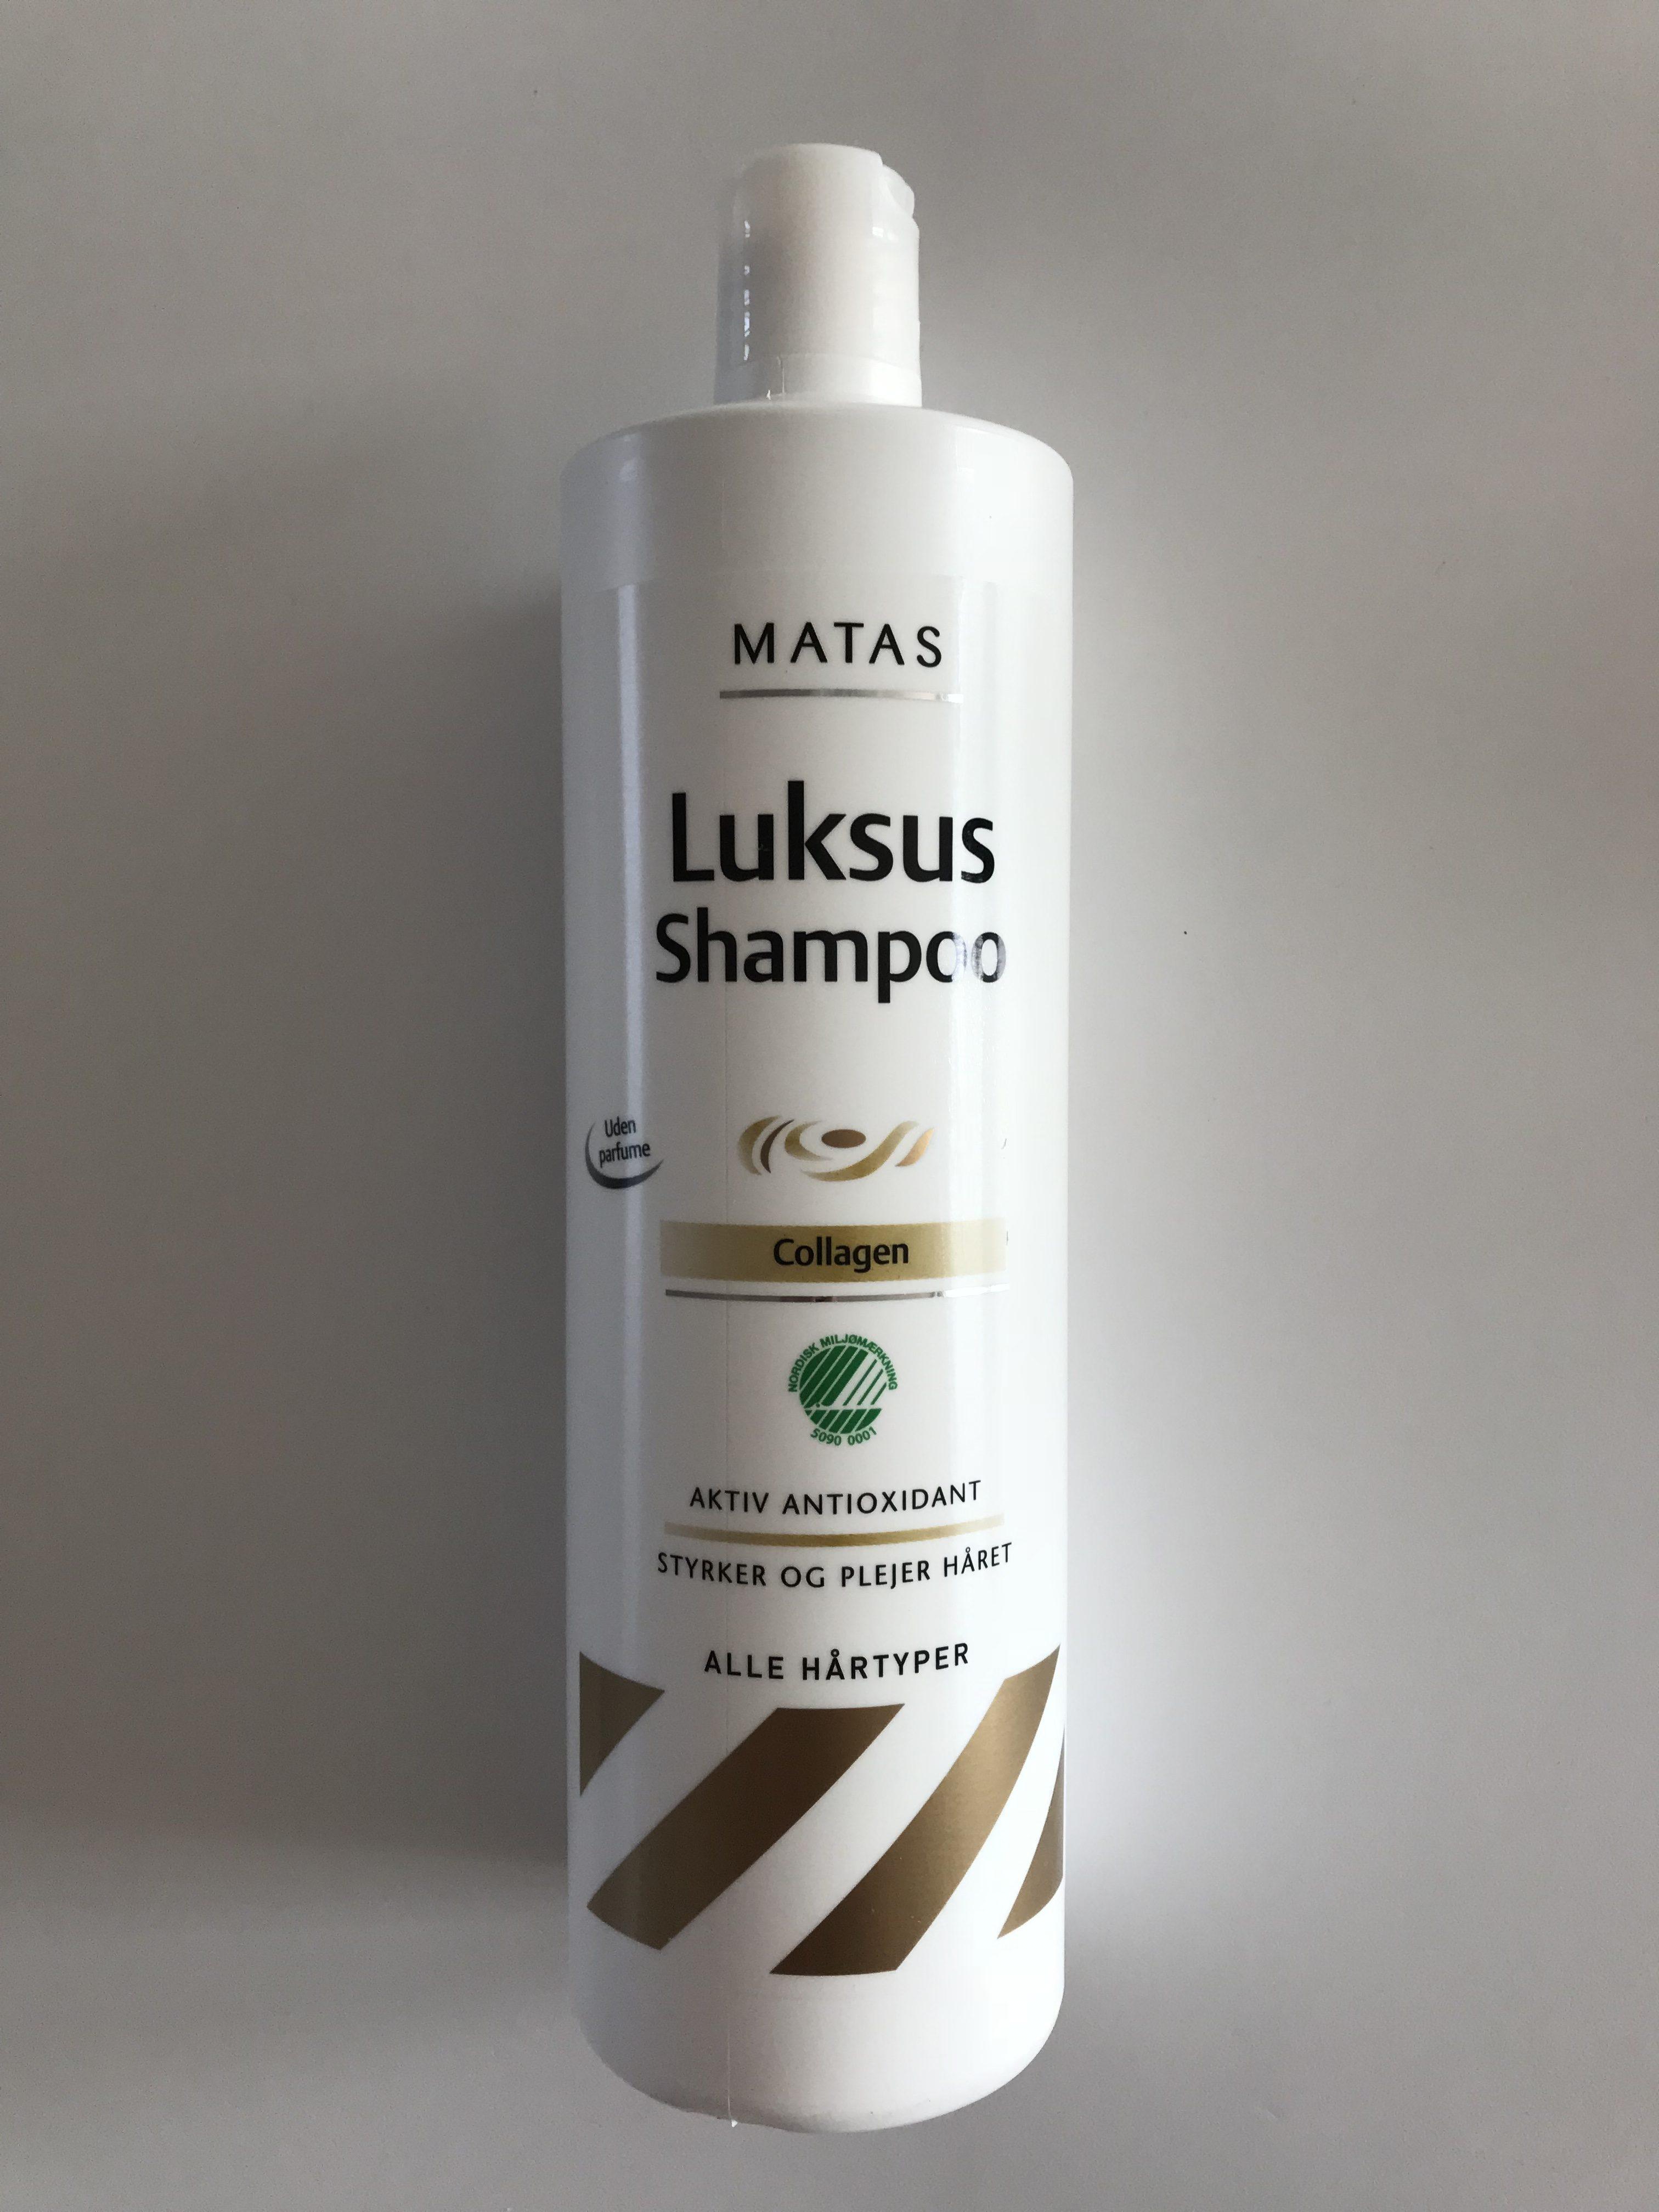 matas luksus shampoo test